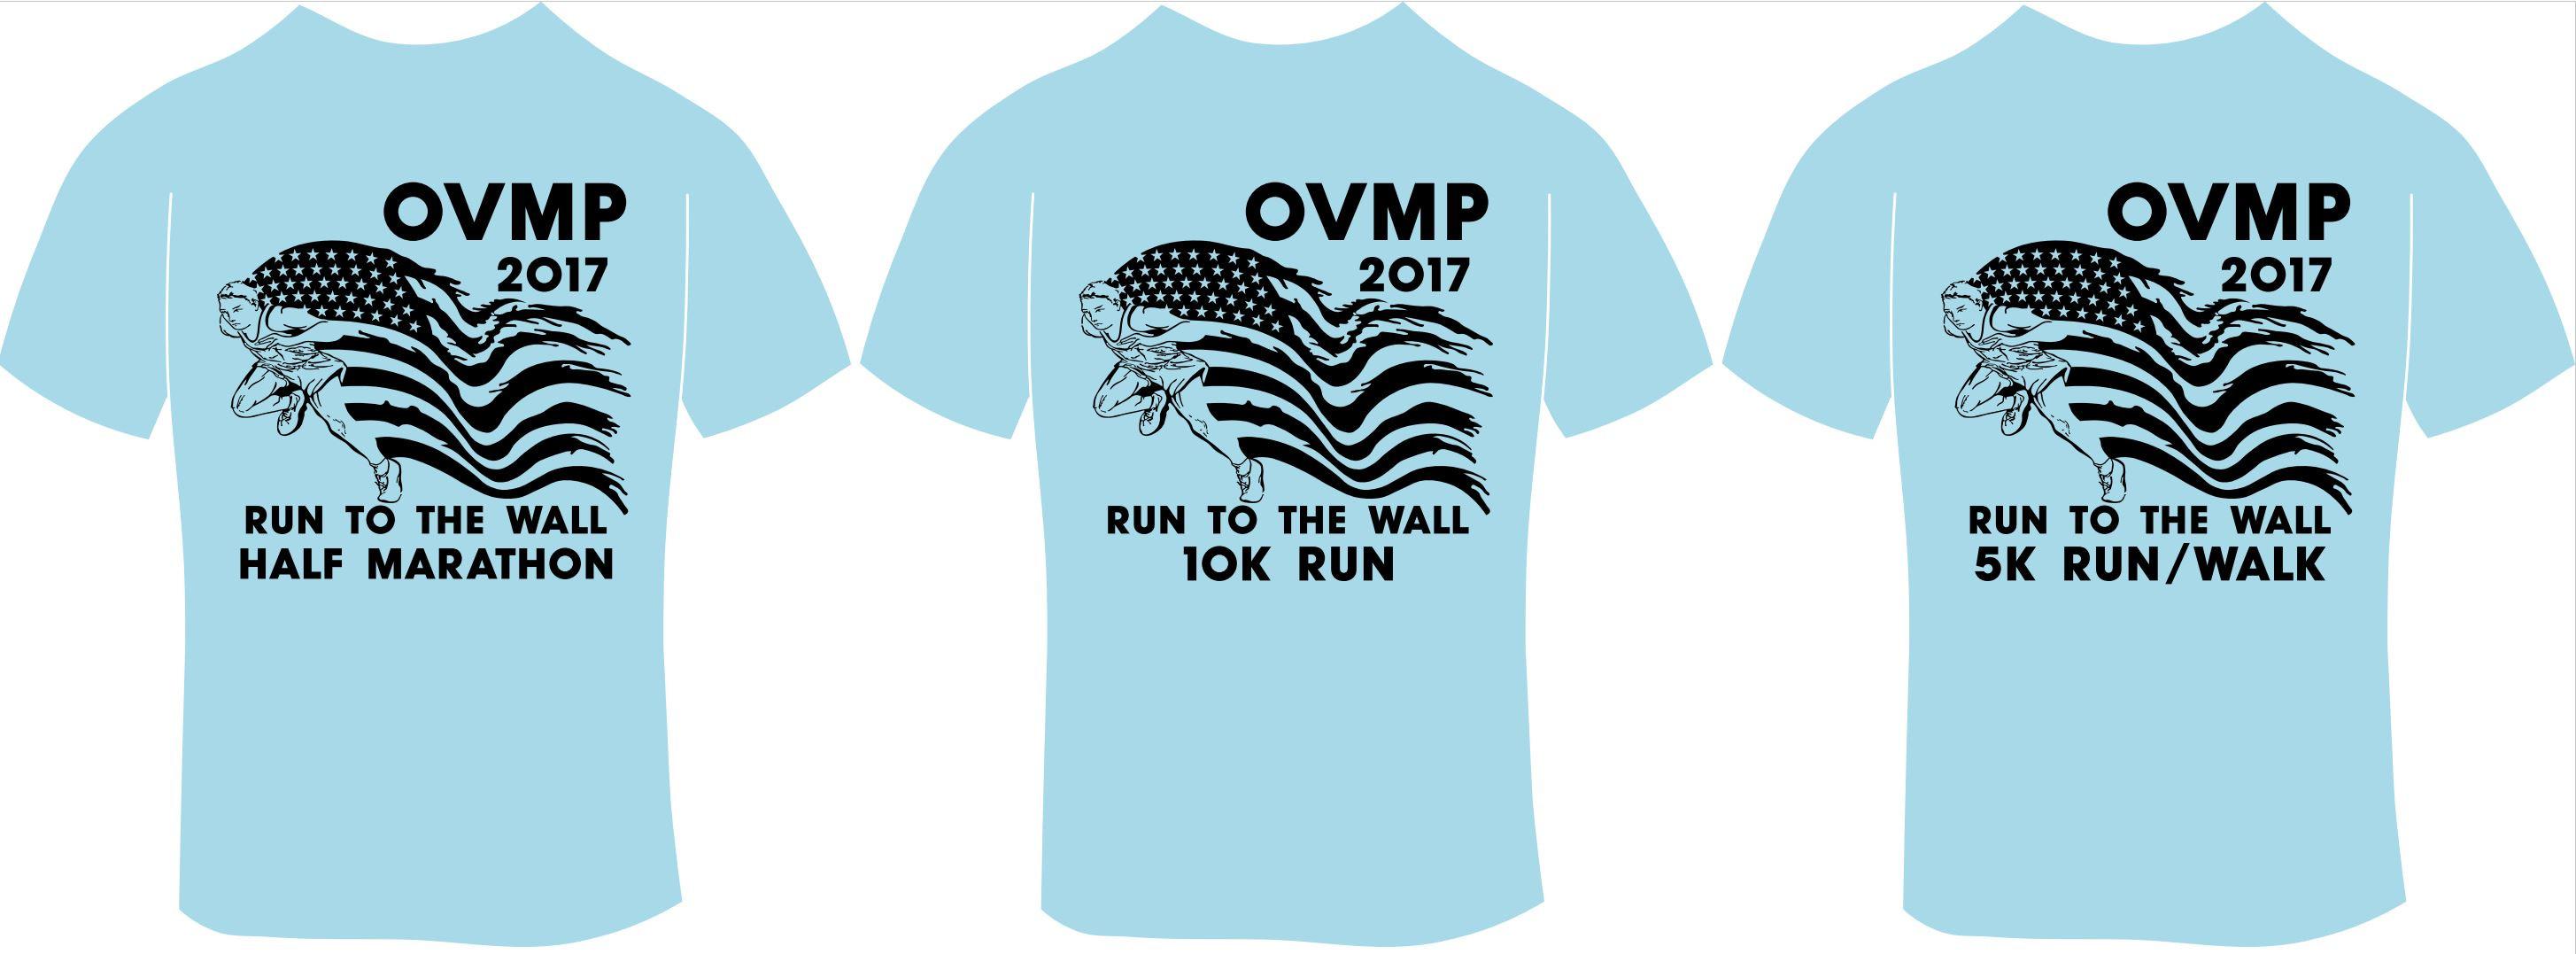 b4ed3e98e0bcb Run To The Wall - 5K Walk, 5K Run, 10K Run, and Half Marathon